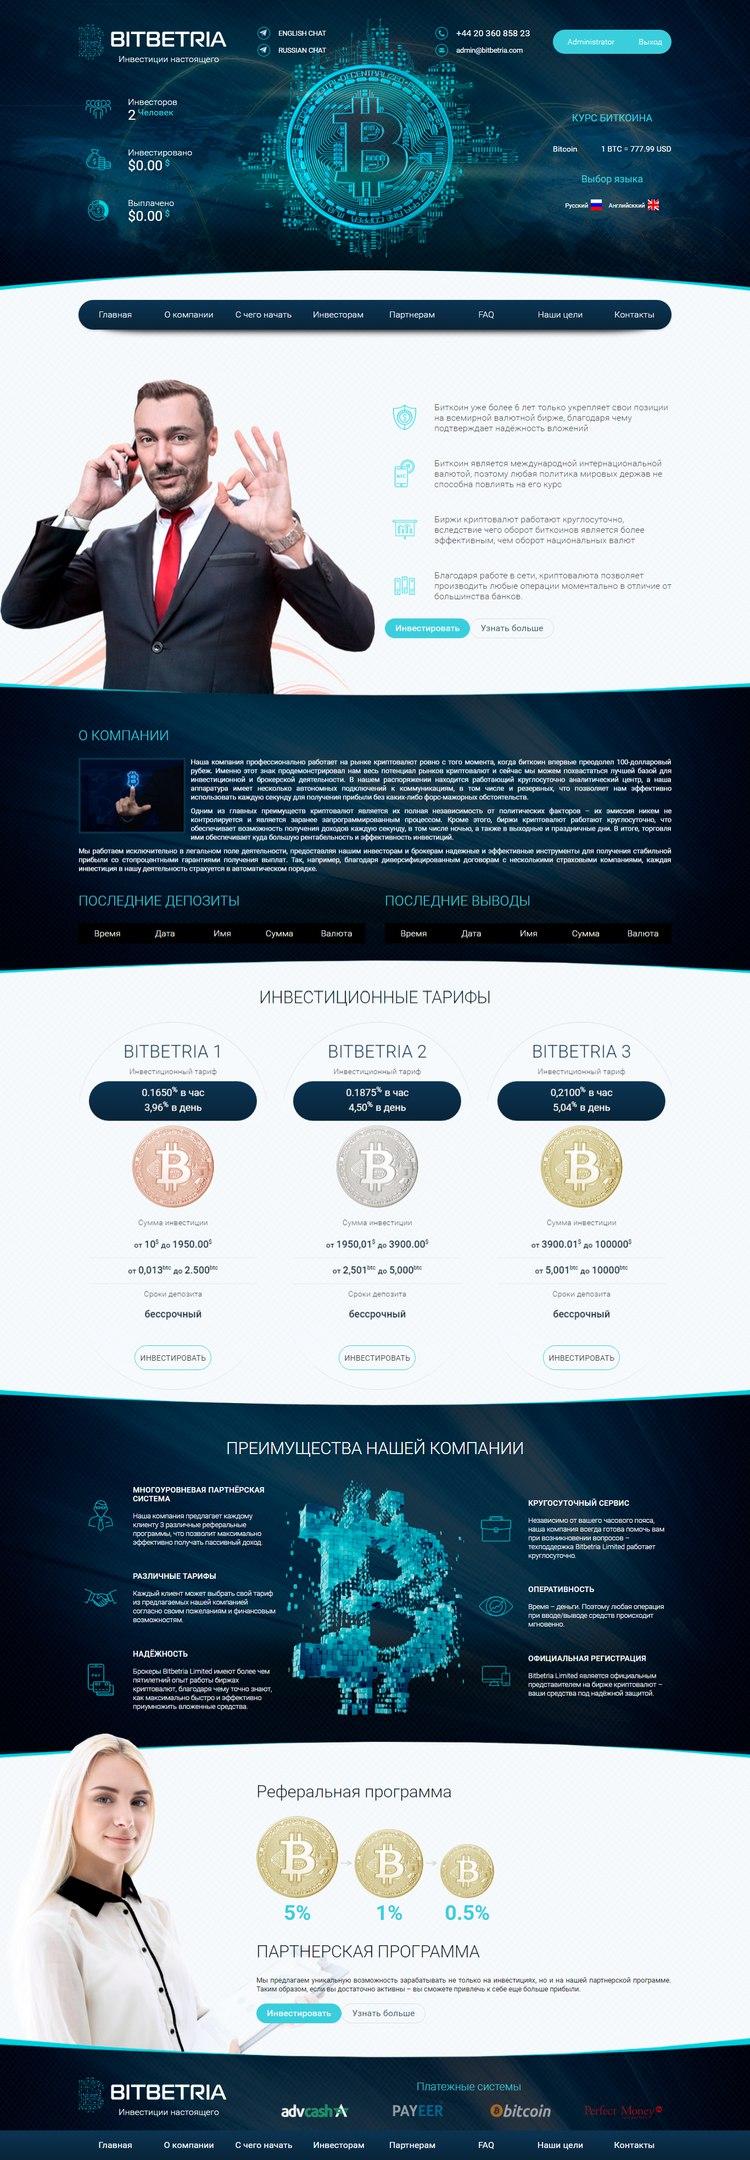 Скрипт хайп проекта BITBETRIA